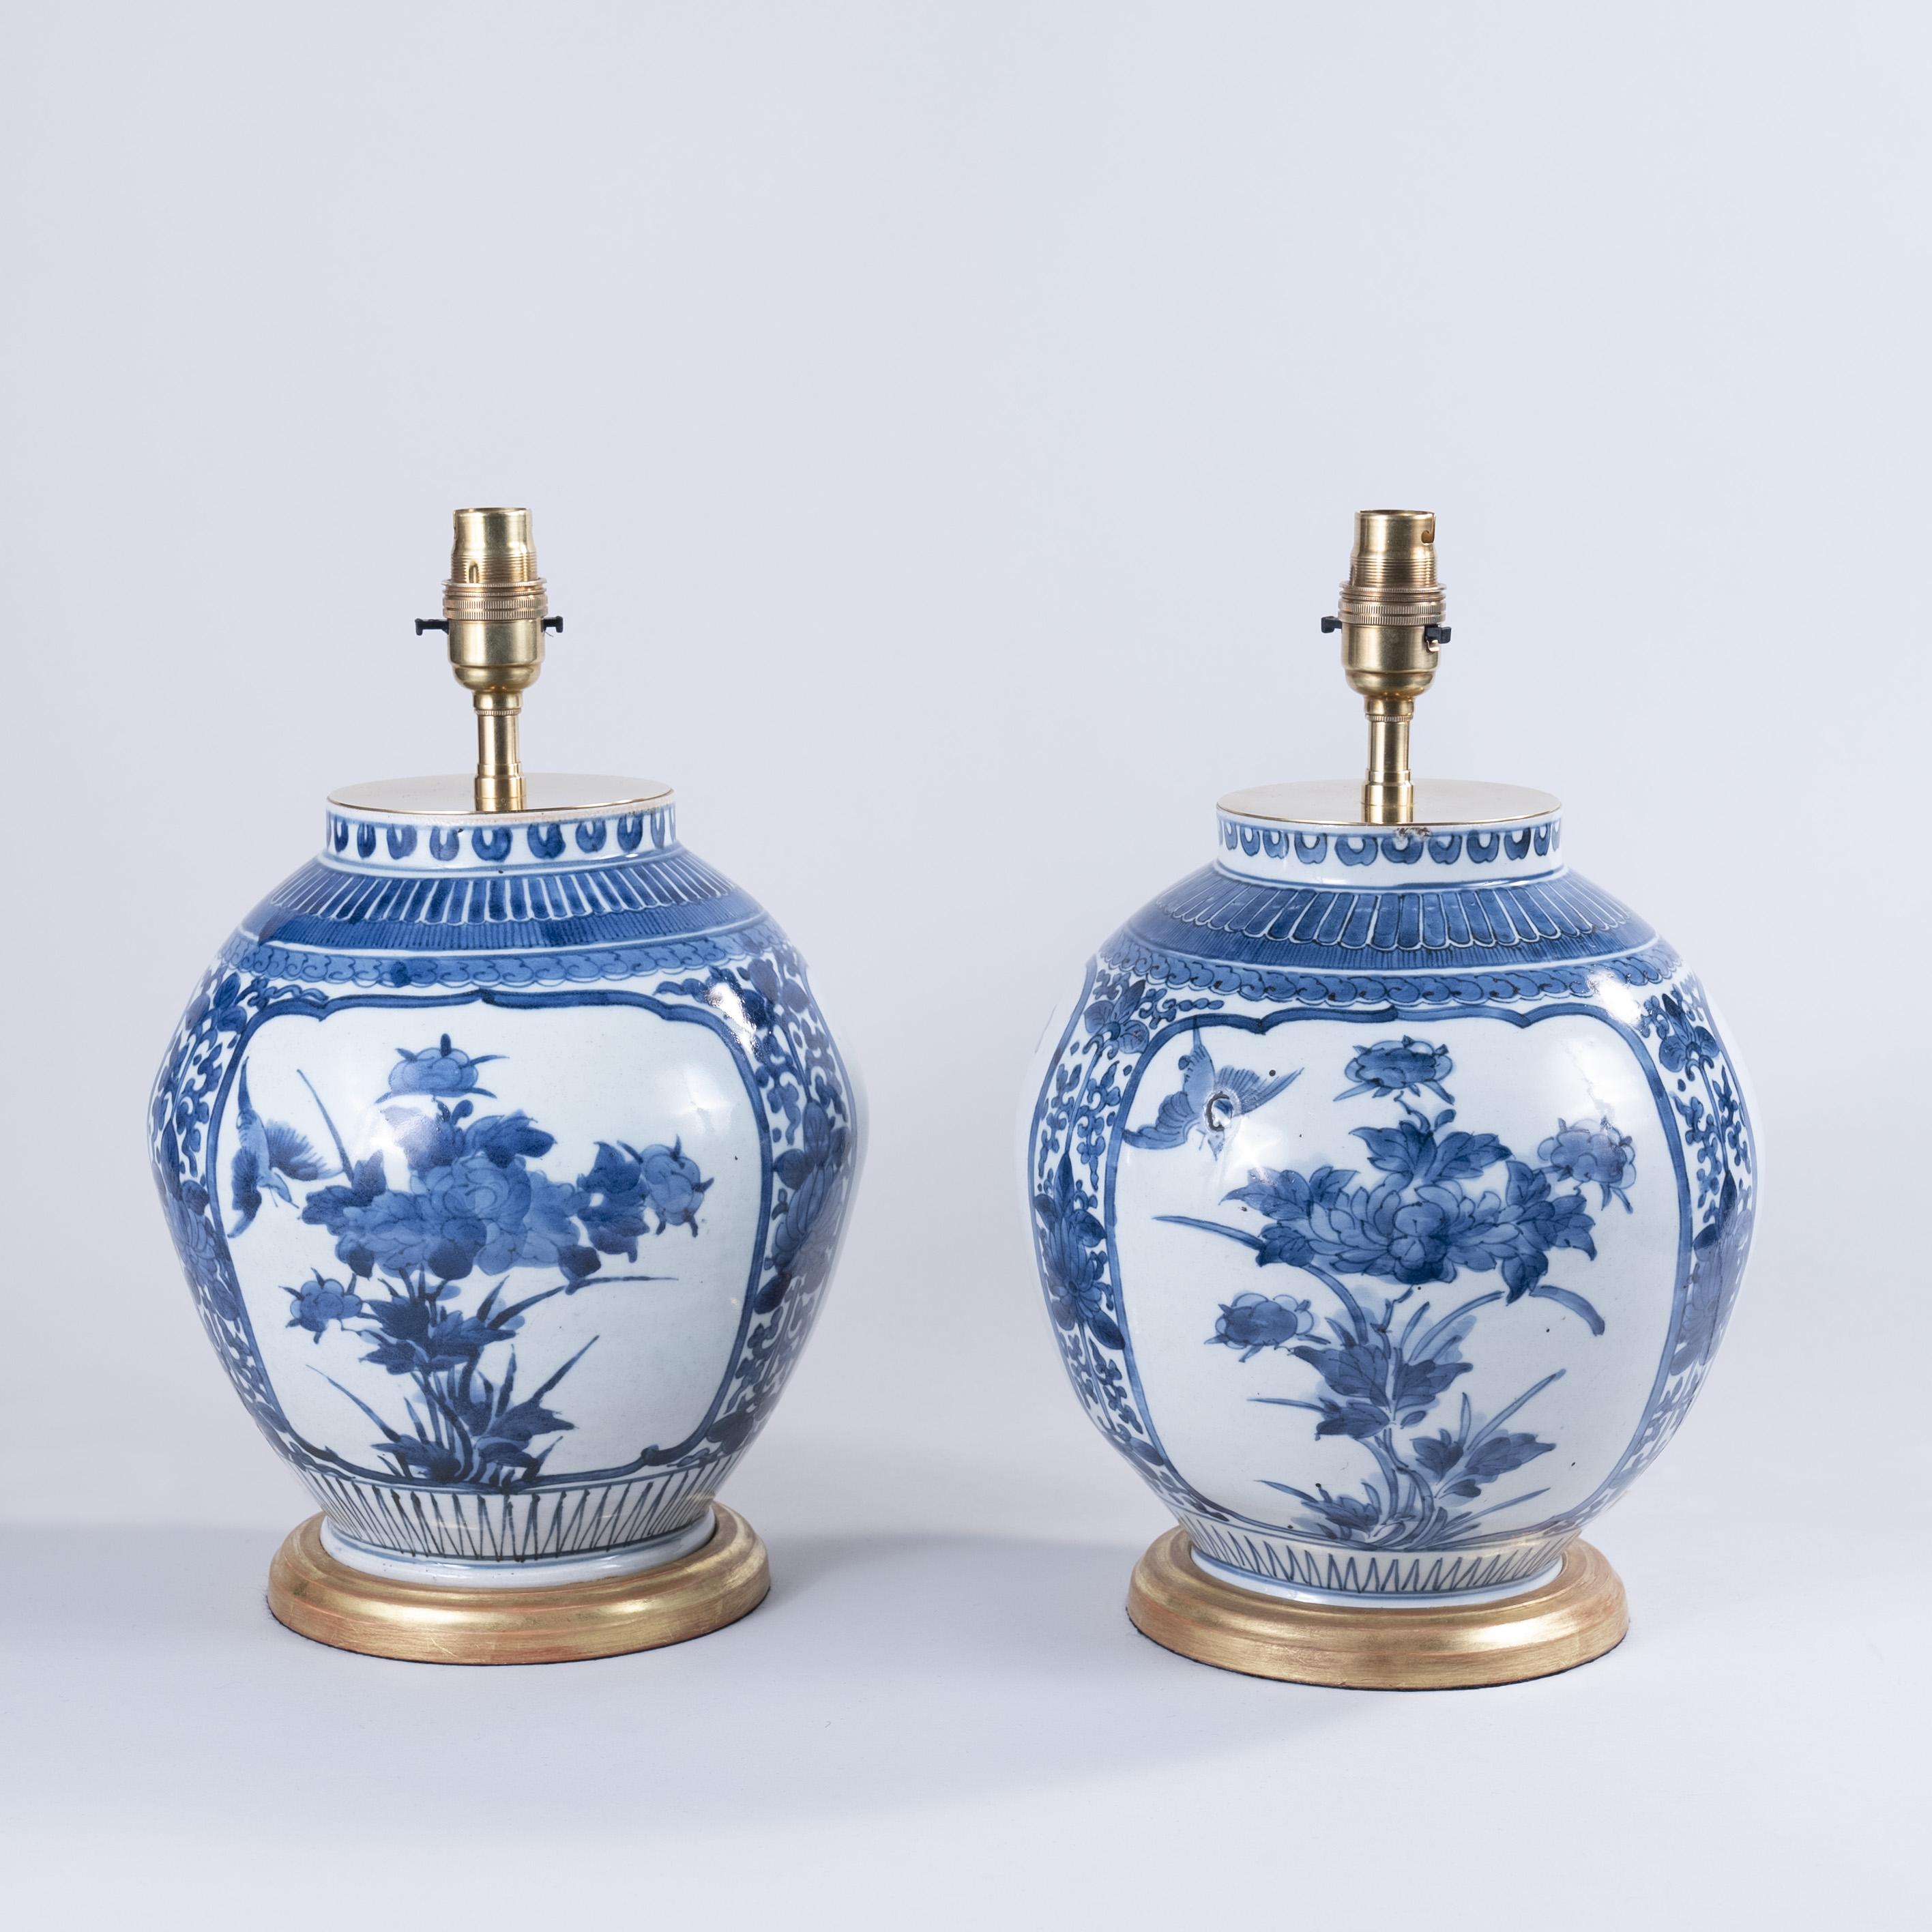 Small Pair of Japanese Arita Vases as Lamps, circa 1700